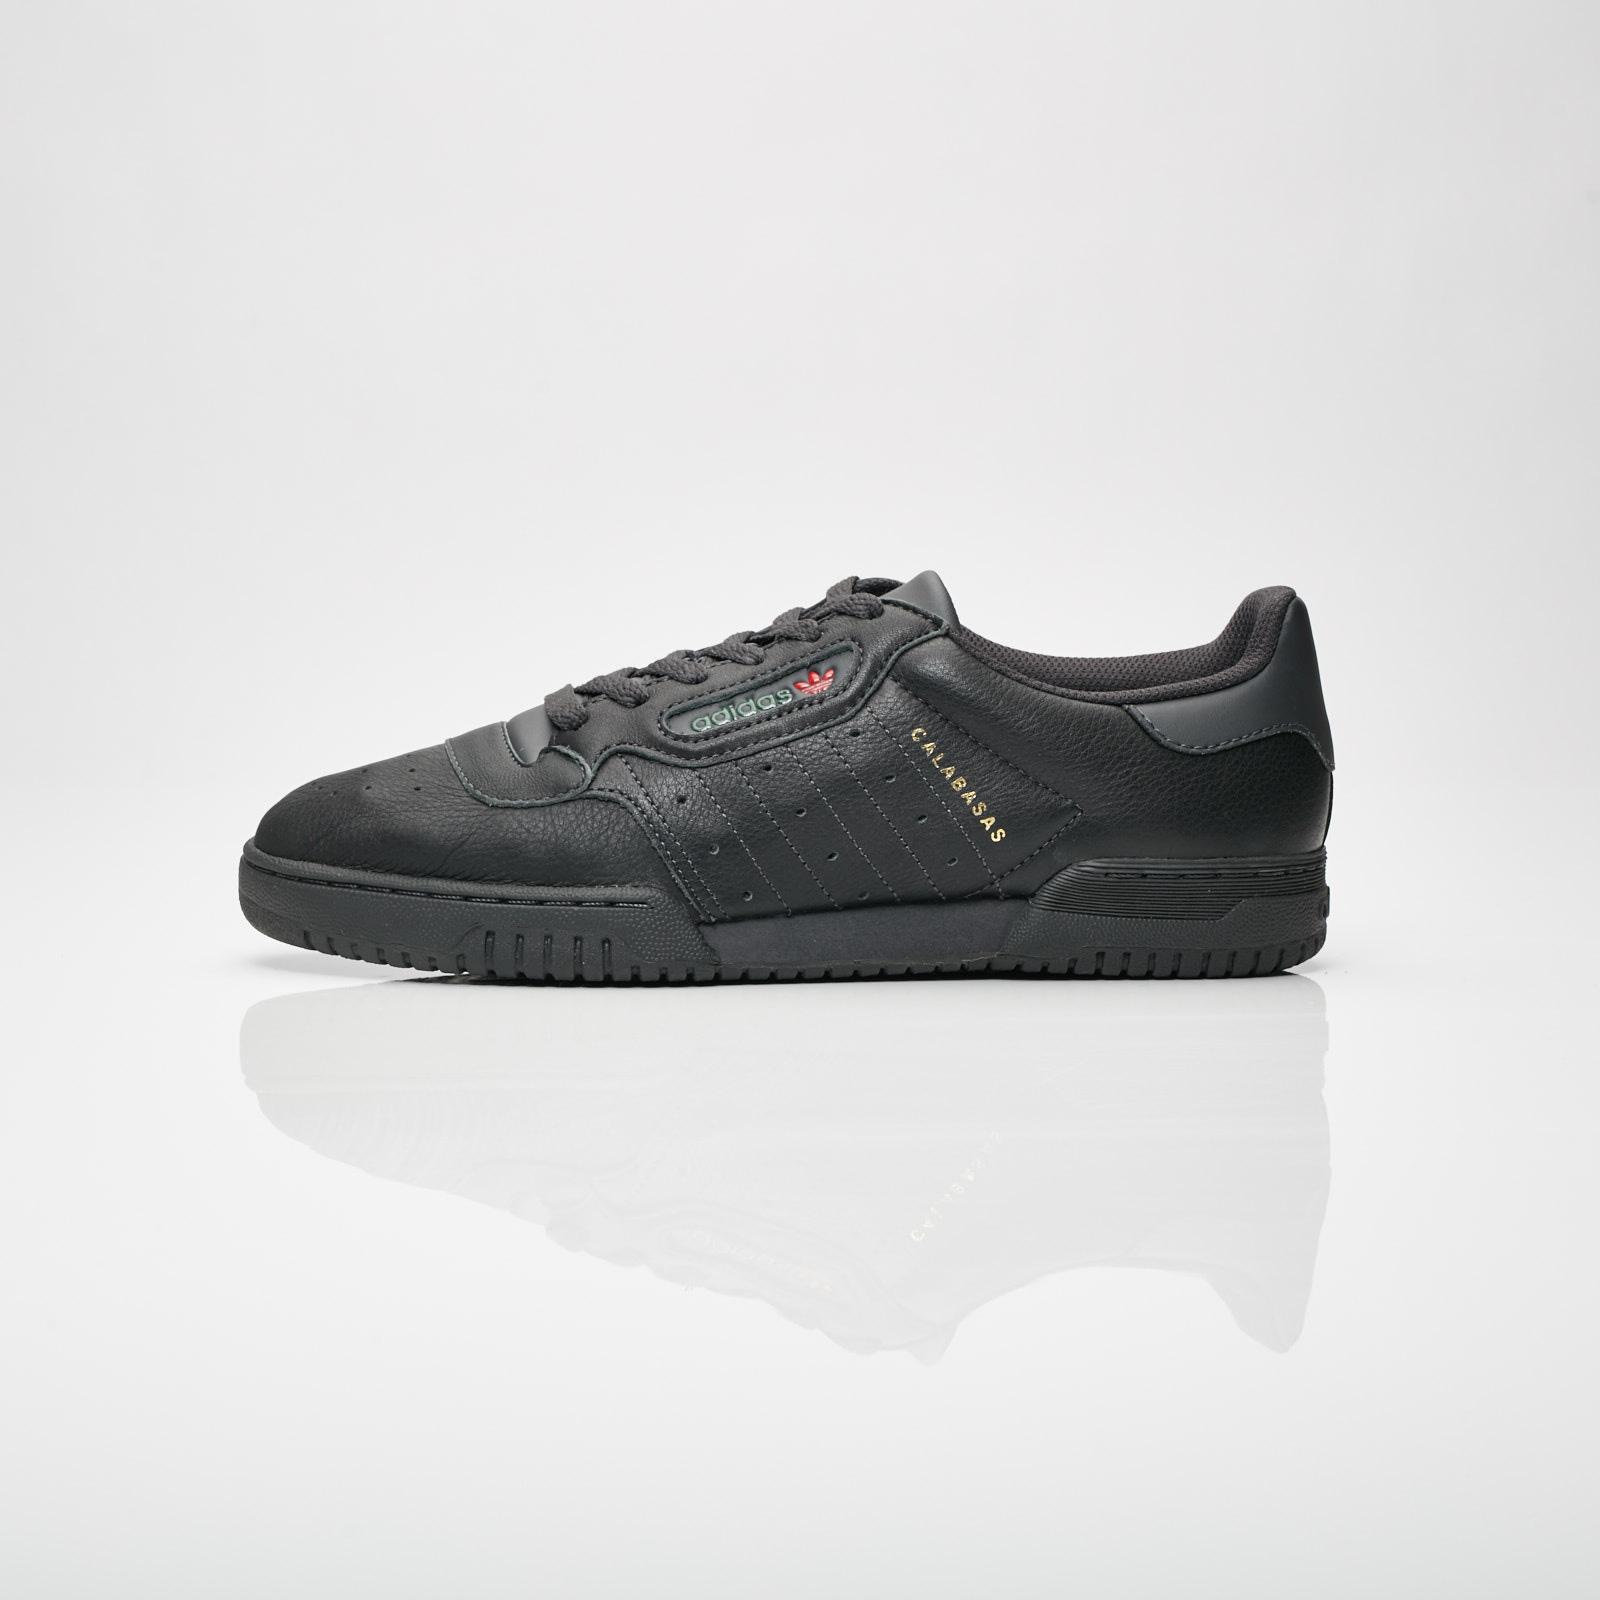 Yeezy I Sneakersnstuff Sneakers adidas Powerphase Cg6420 FT31JKcl